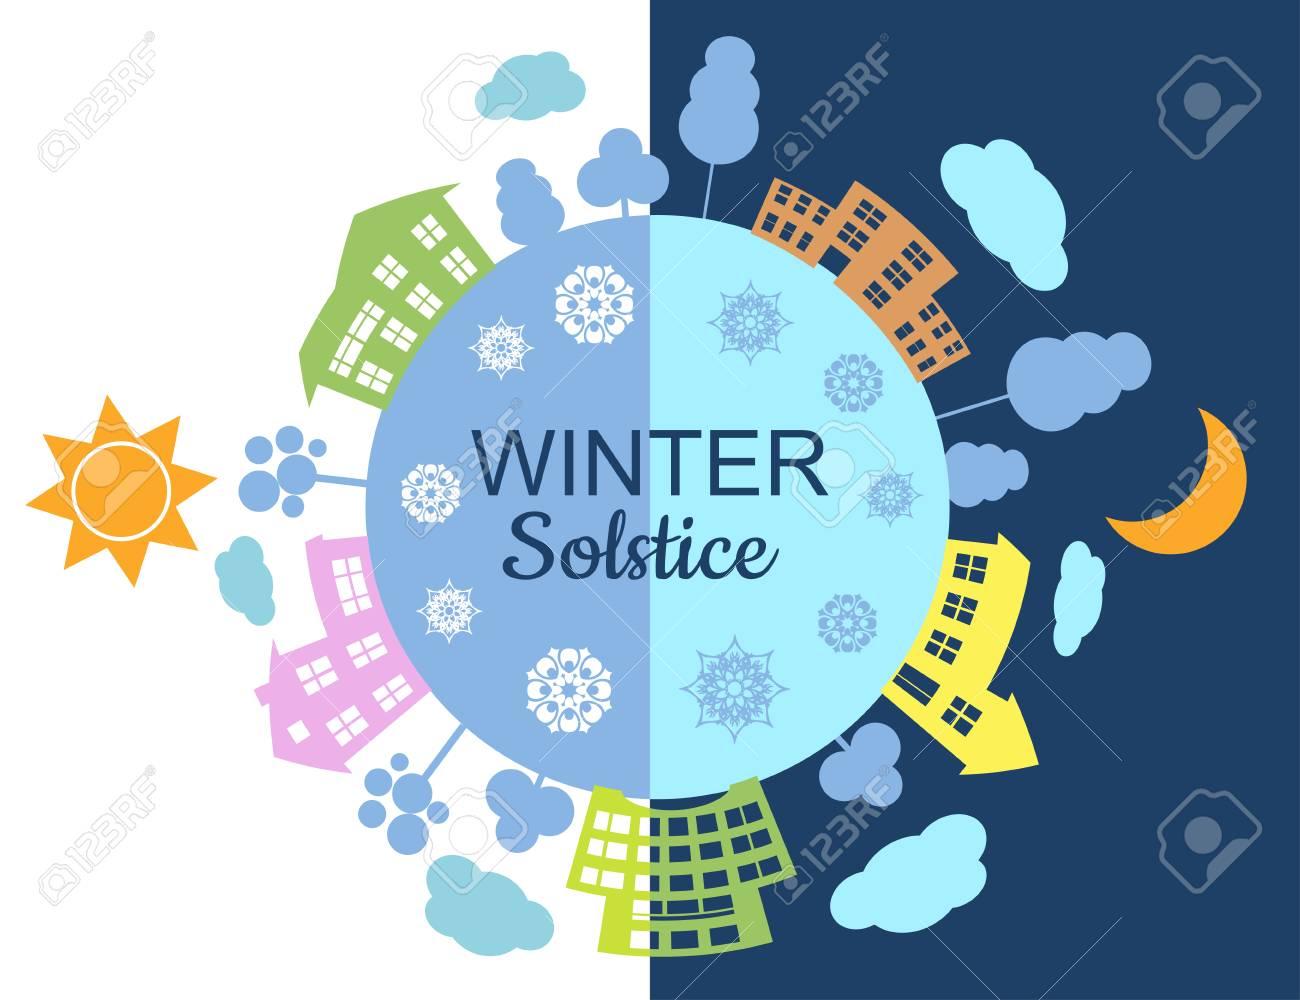 Winter Solstice illustration - 103742575